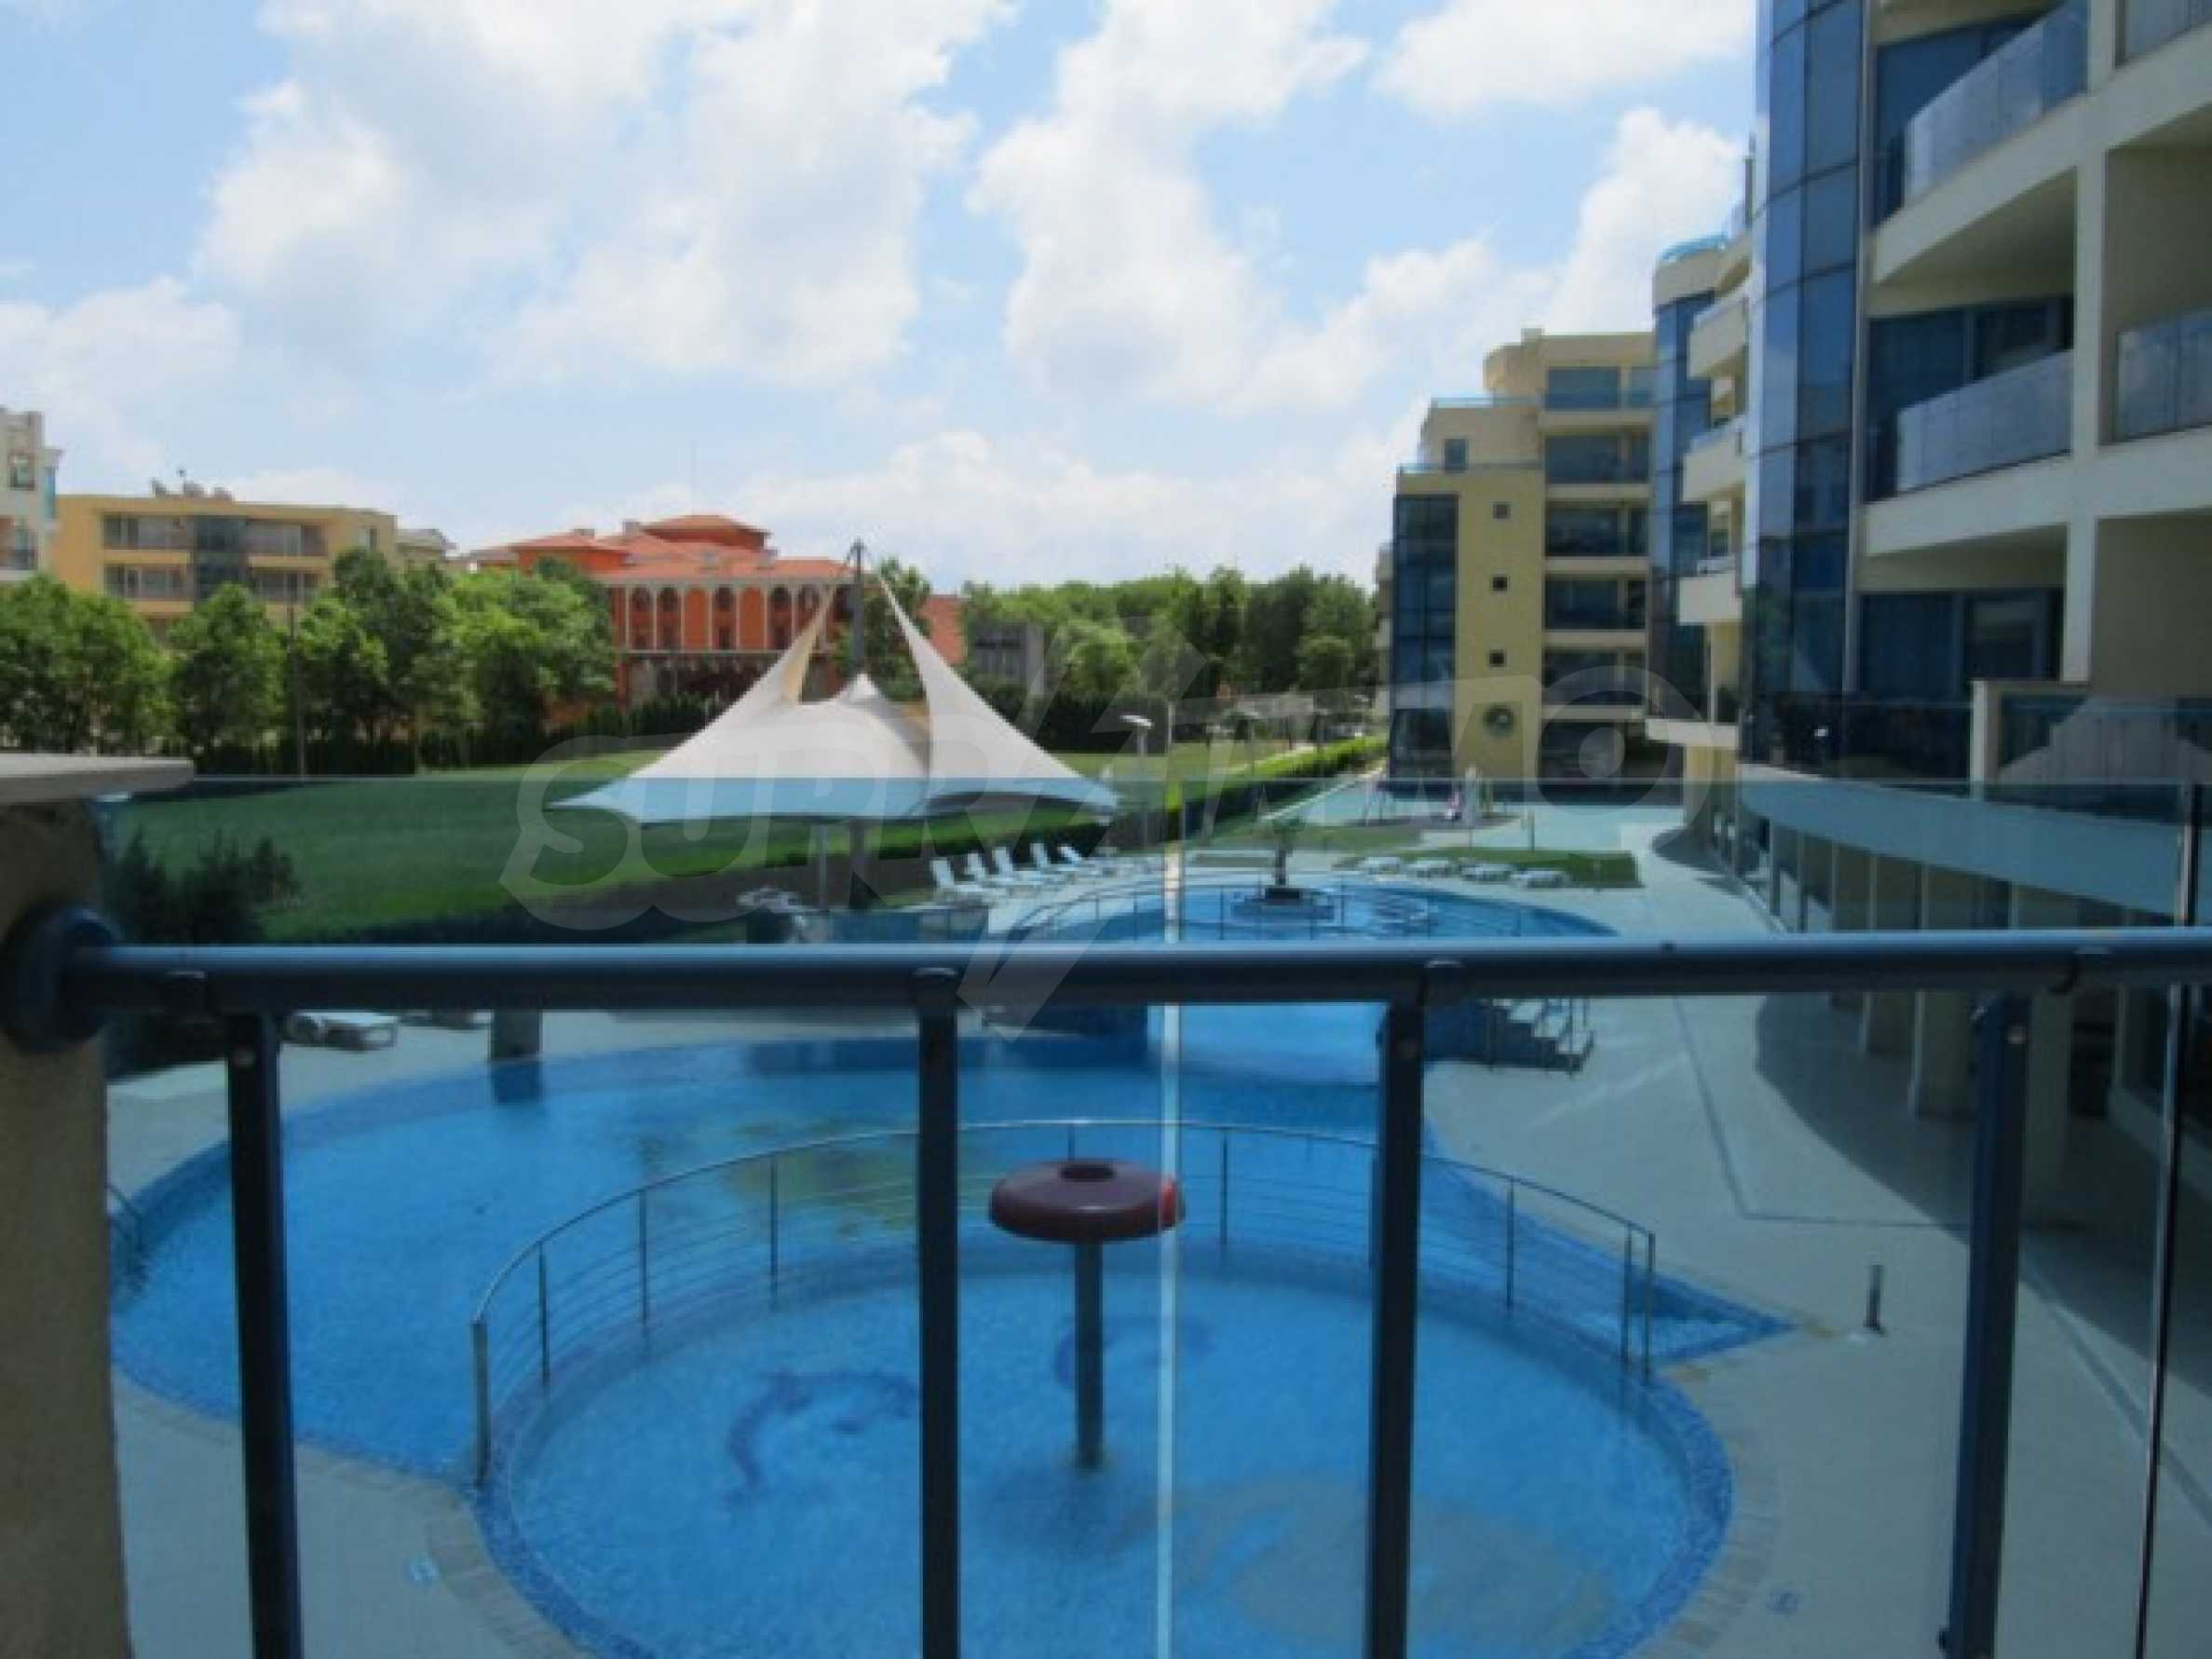 Тристаен апартамент за продажба в Поморие 24